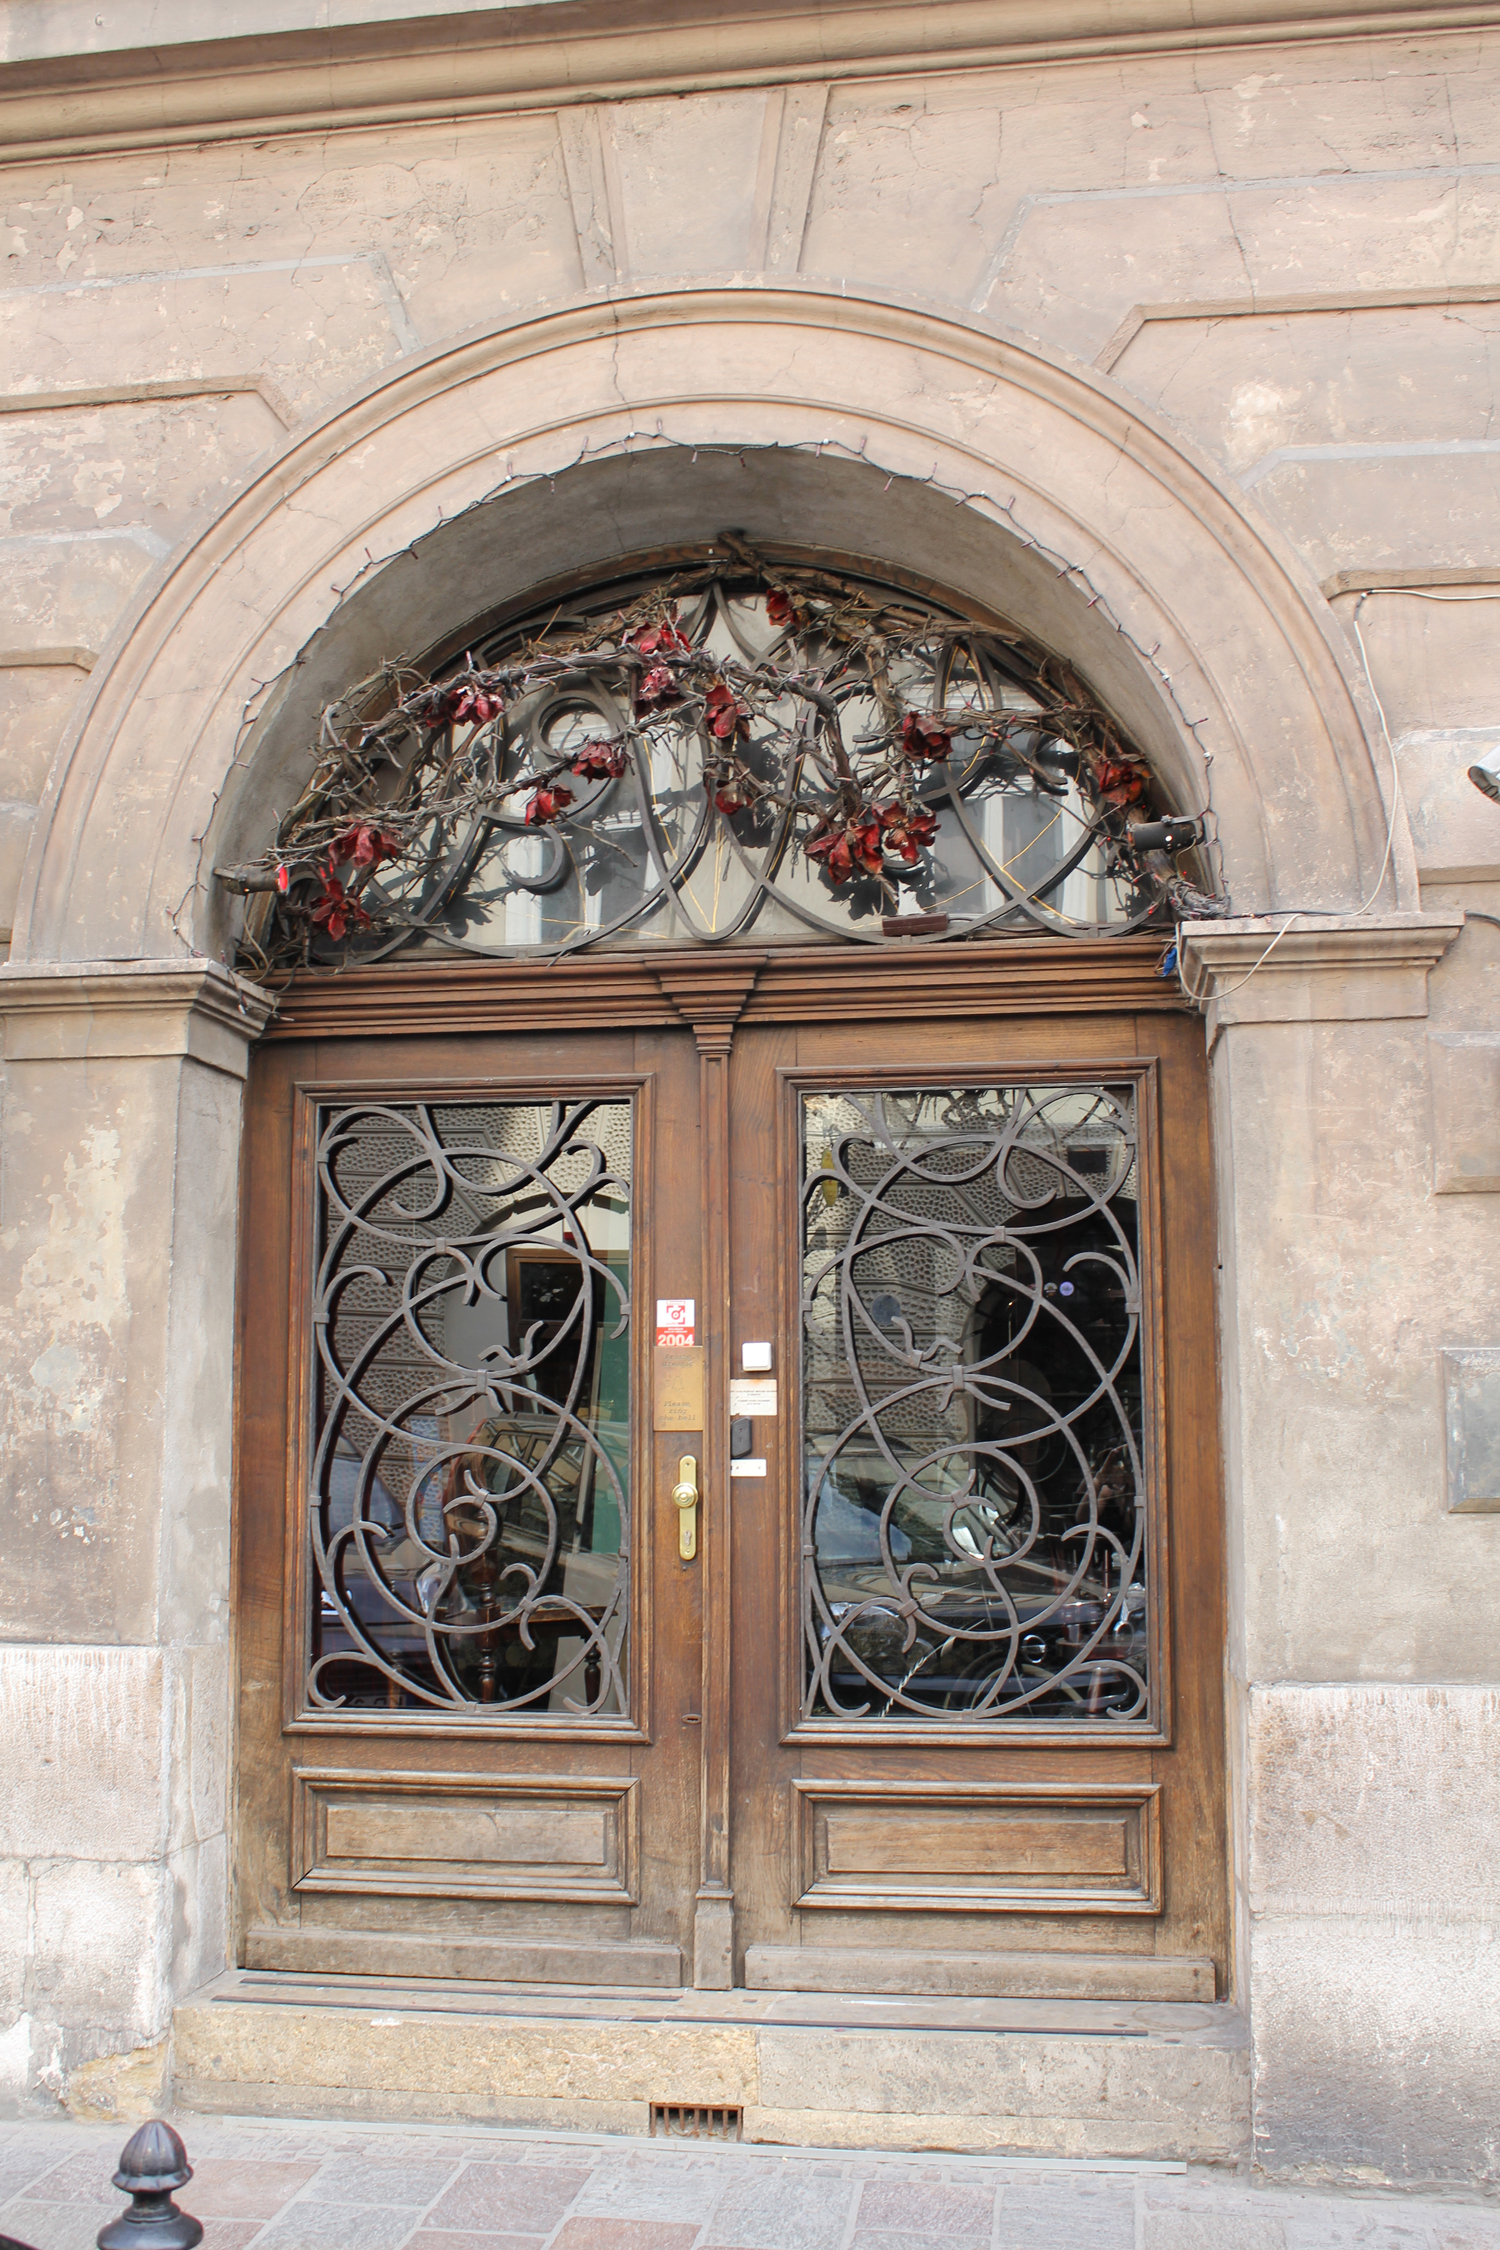 Timber door with intricate ironwork